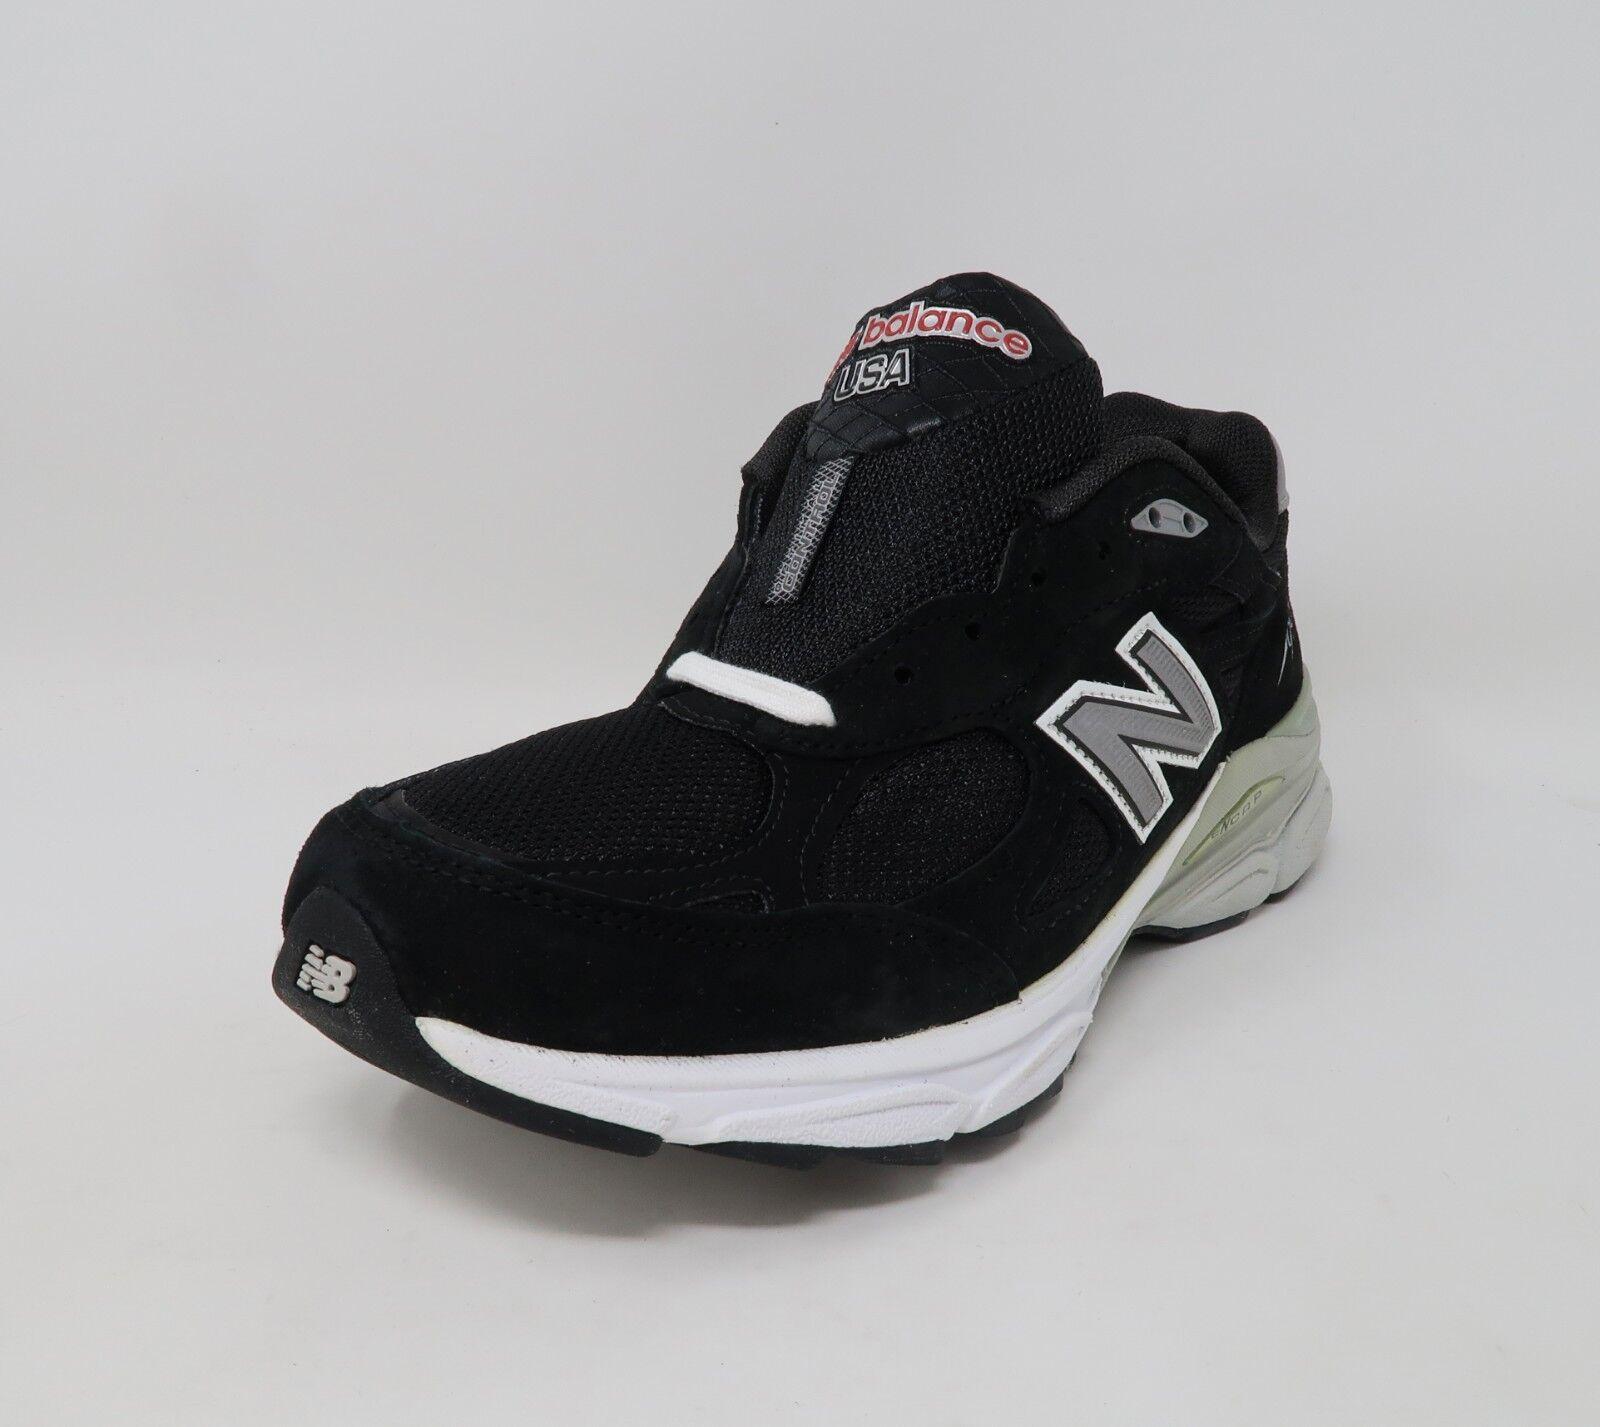 New Balance Balance Balance Women shoes Black 990 NB Premium Sneakers  2580 98d3d7